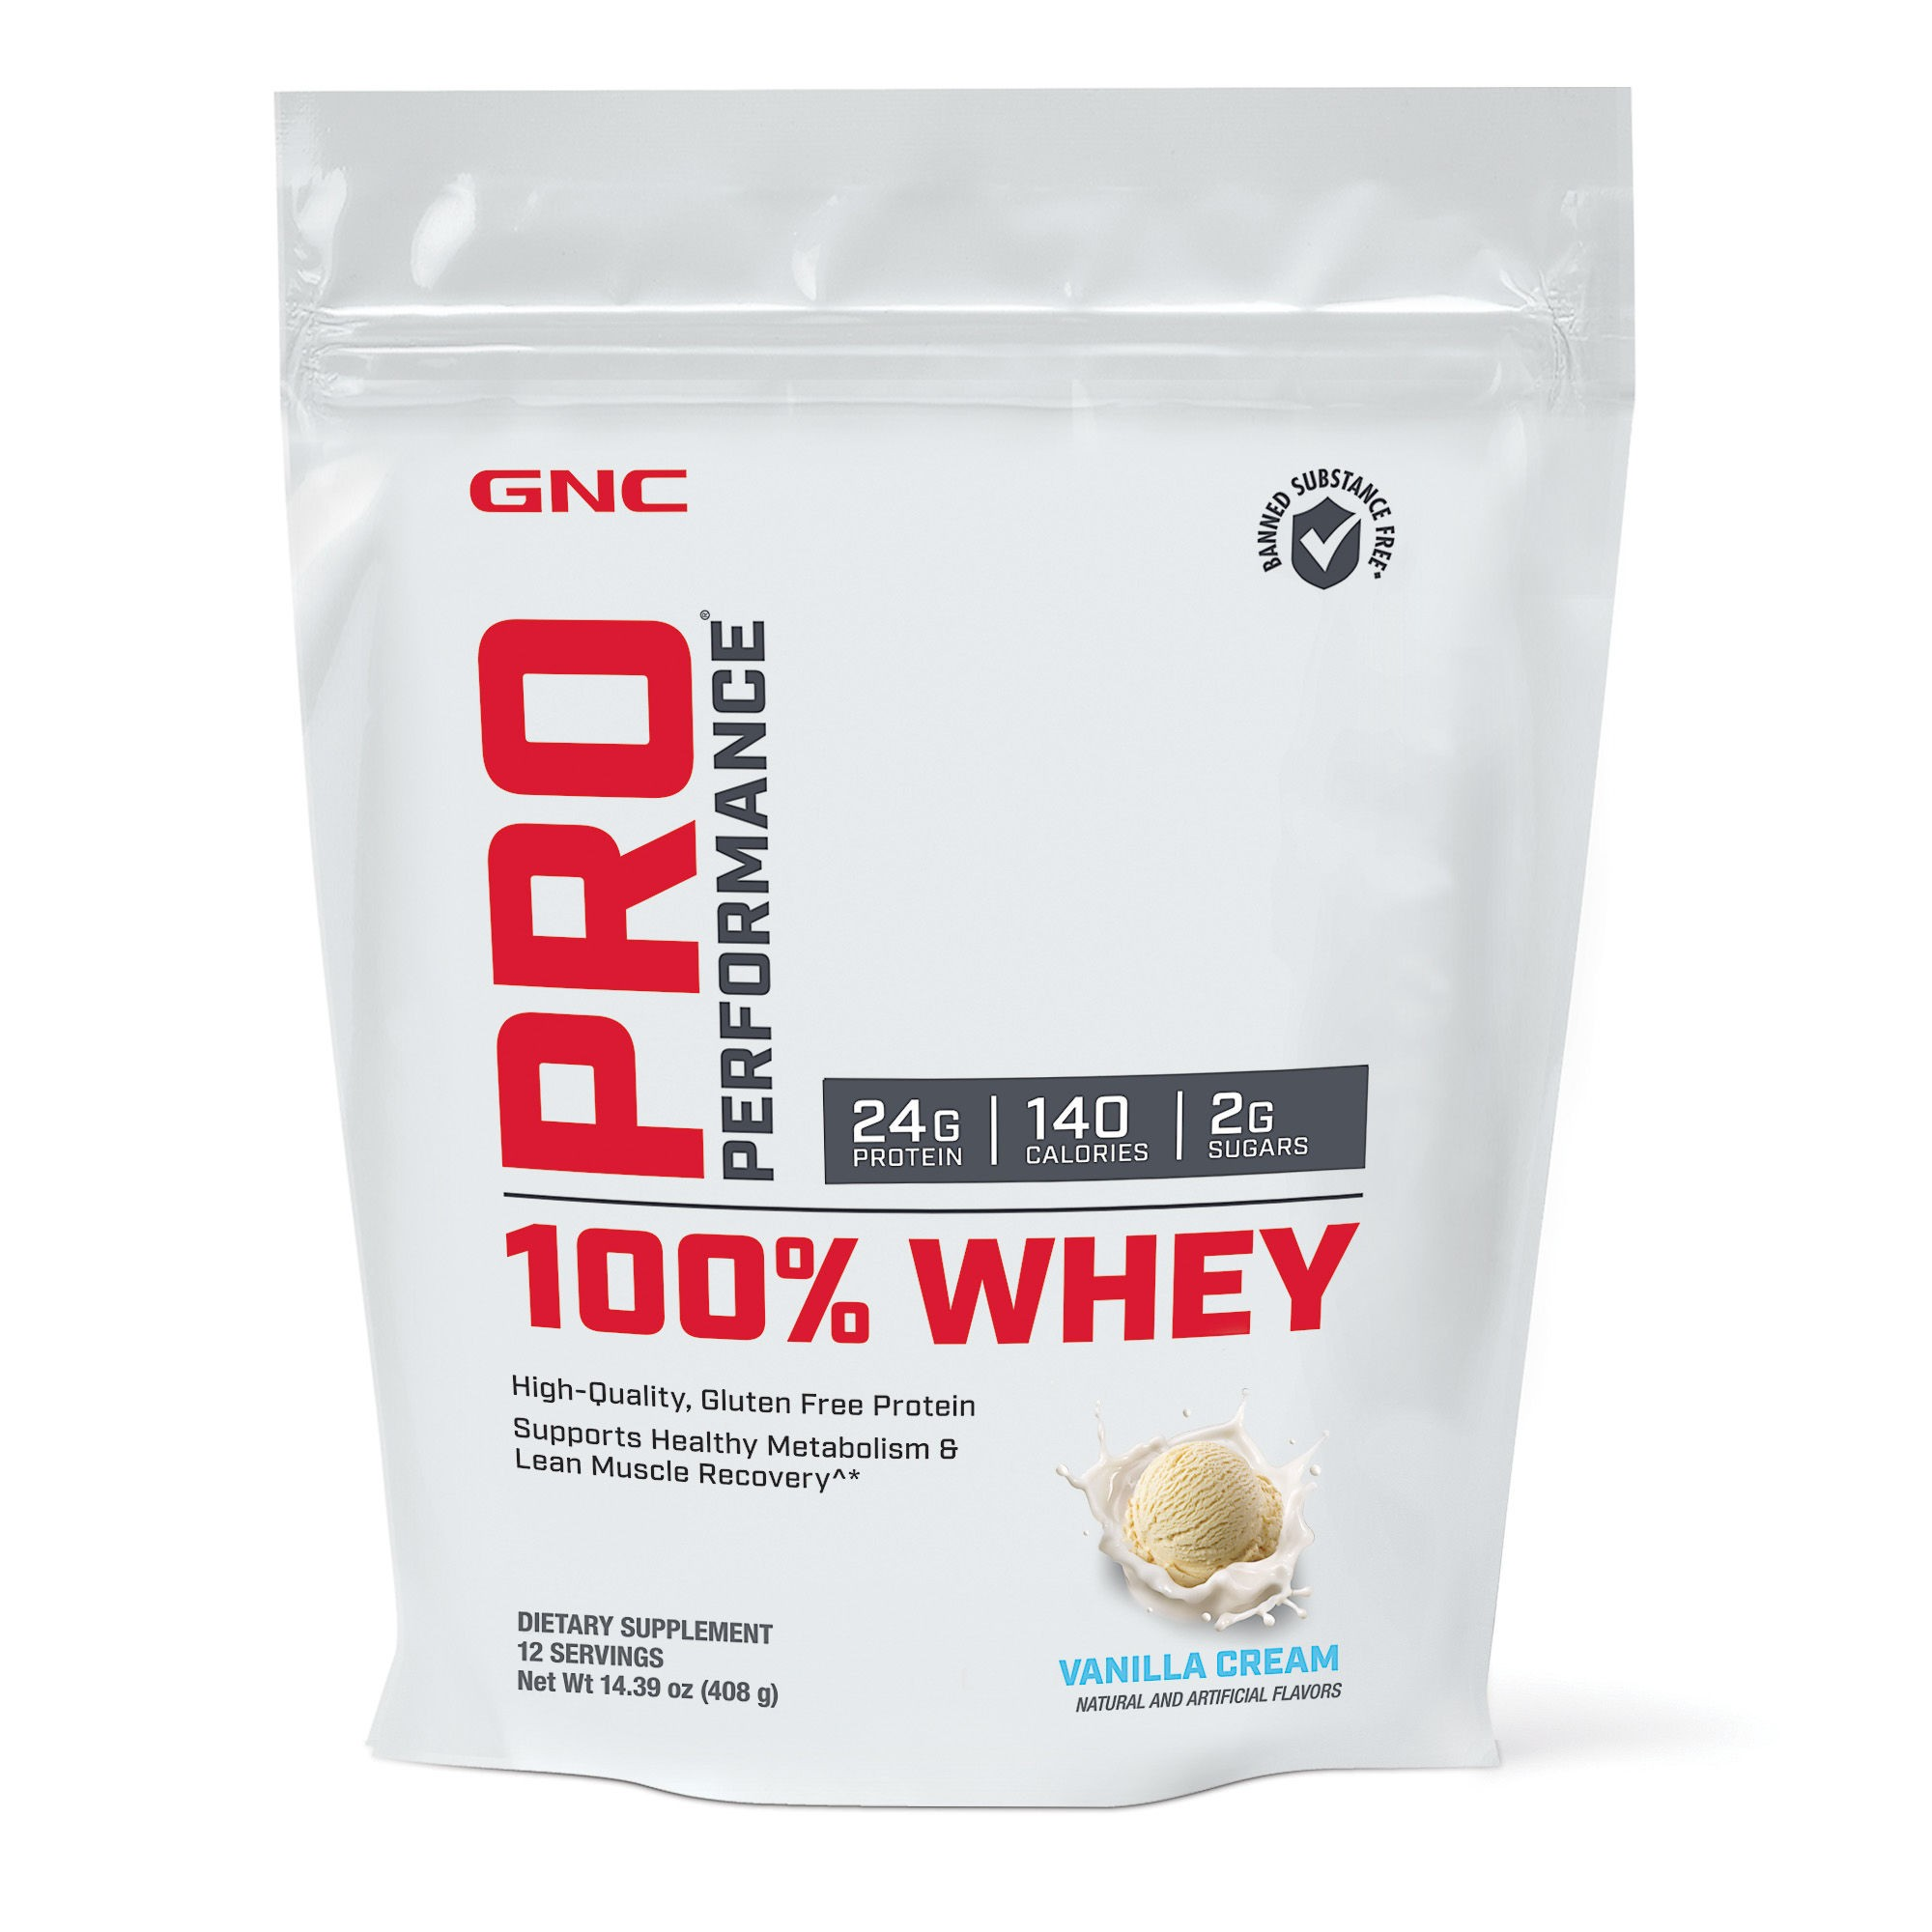 GNC Pro Performance® 100% Whey, Proteina din Zer, cu Aroma de Vanilie, 408g